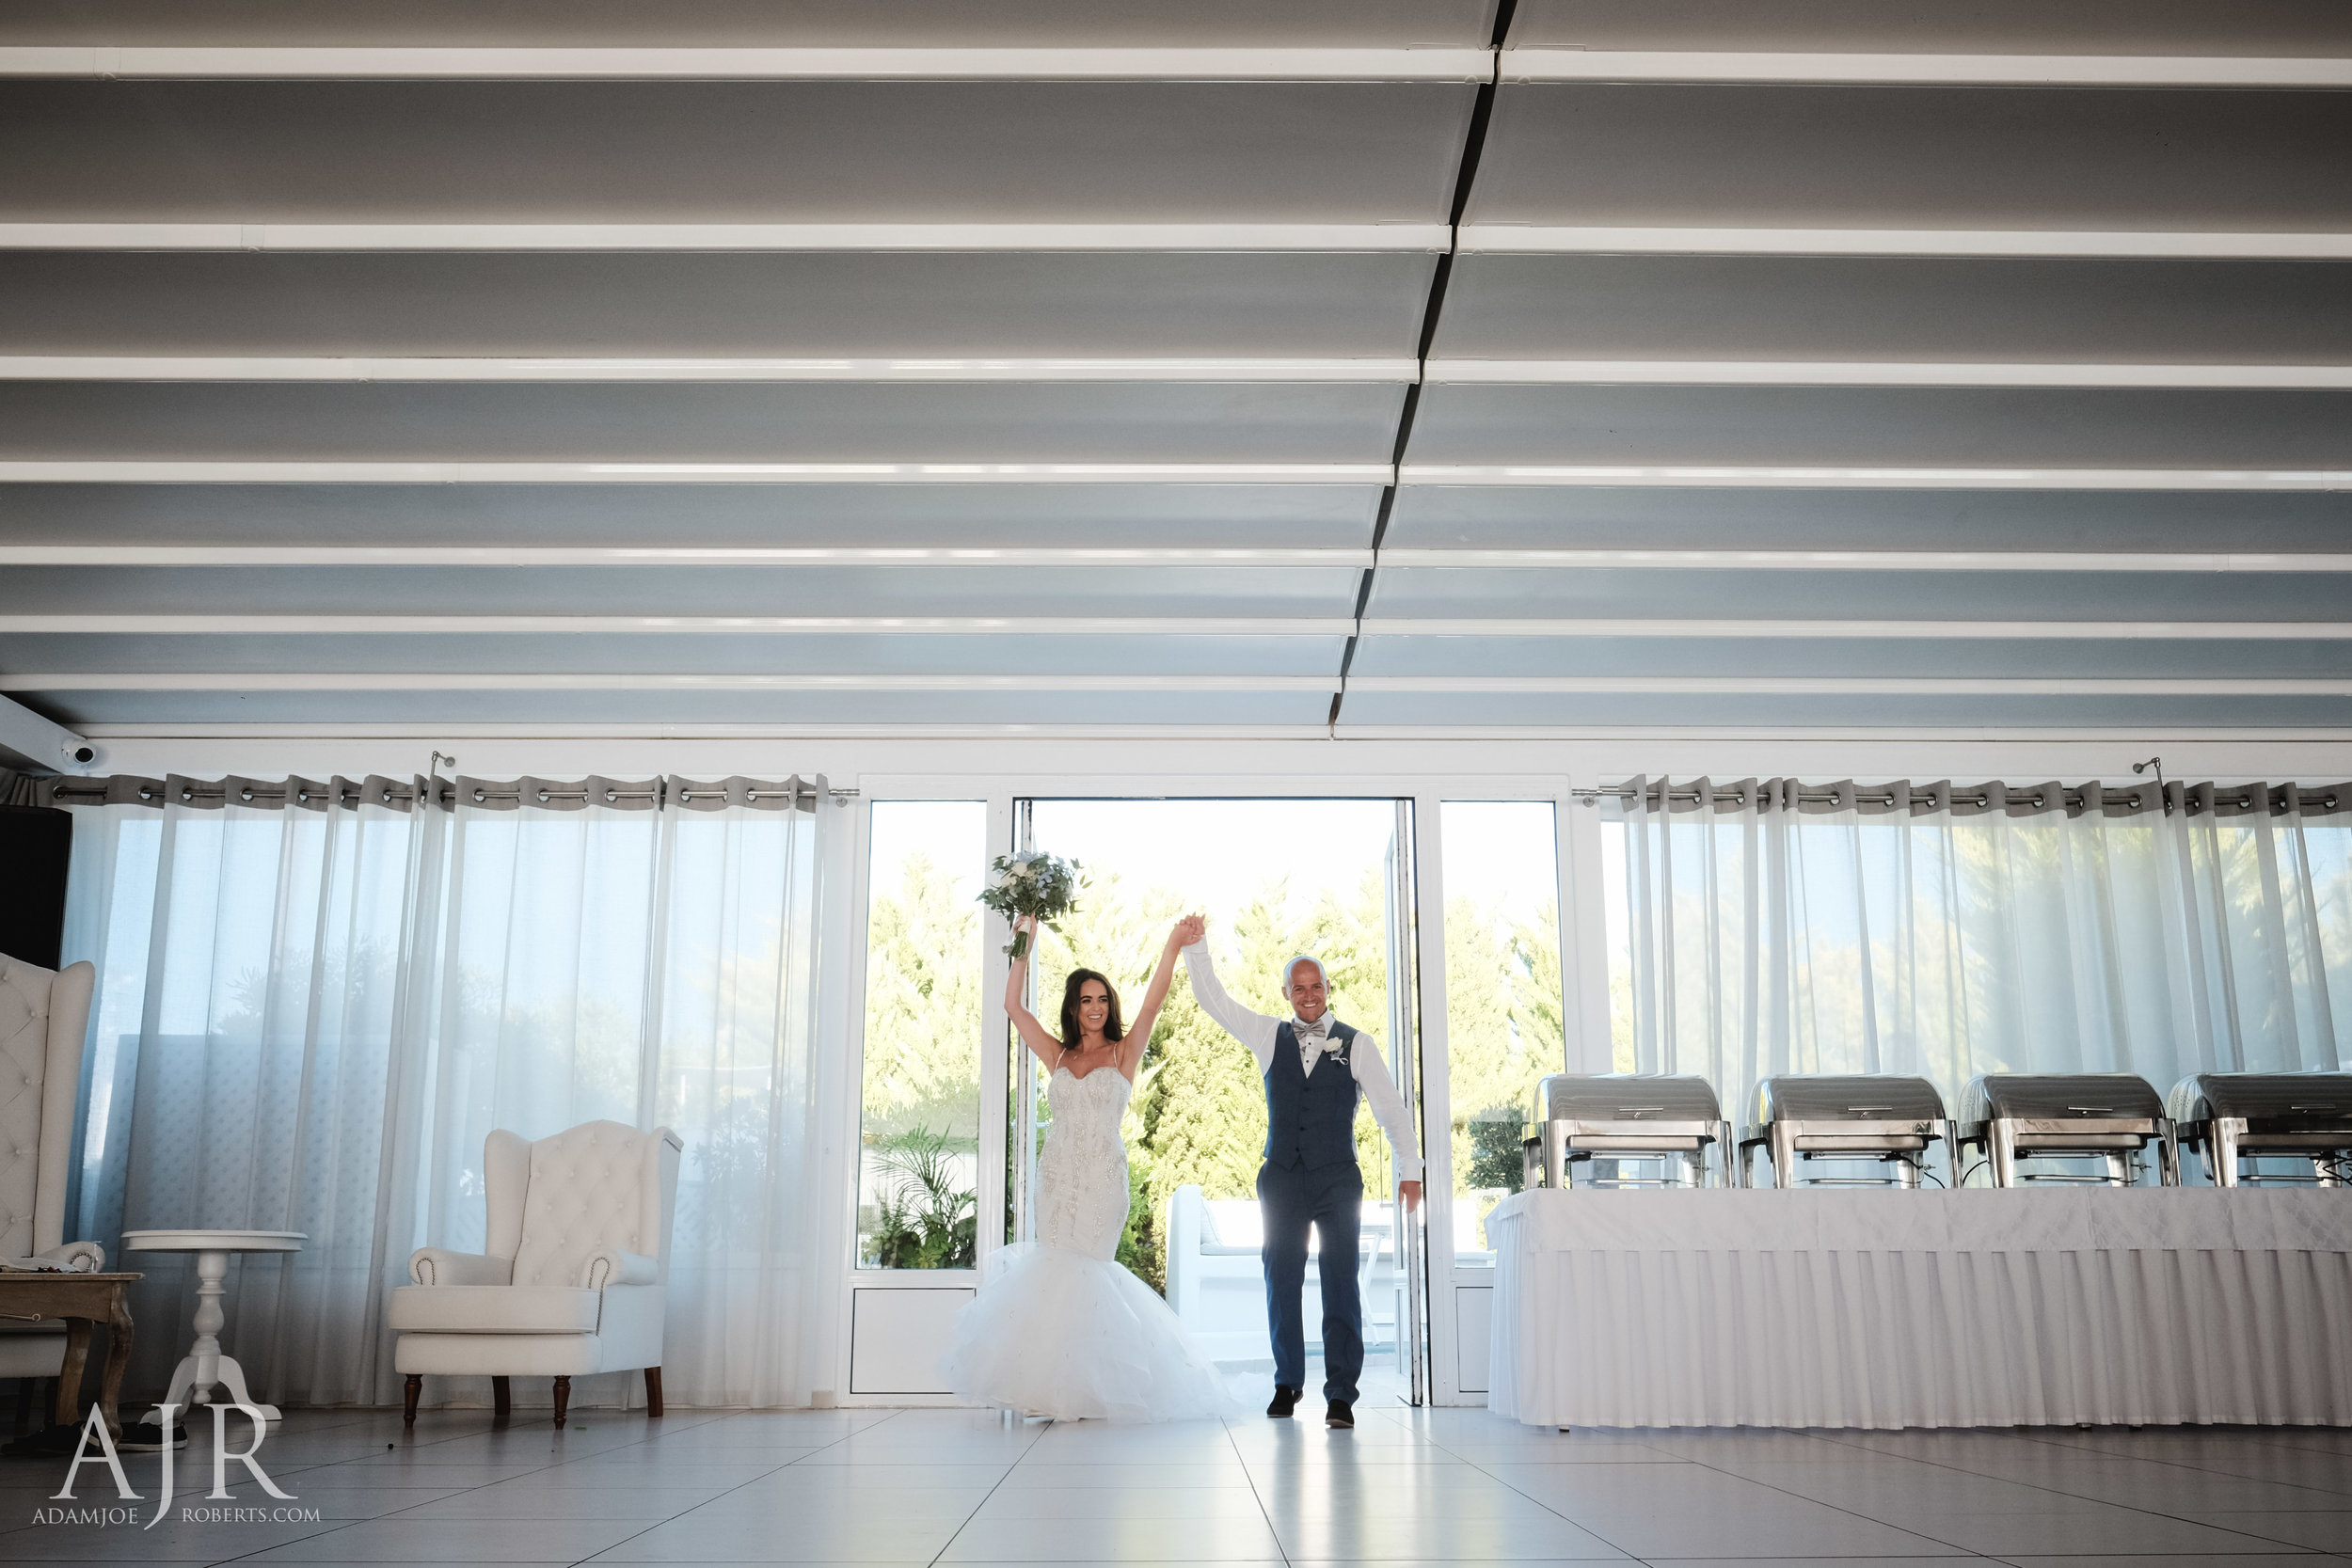 Mollie and Antony Le Ciel Santorini Destination Wedding - Sneak Peek (9 of 15).jpg